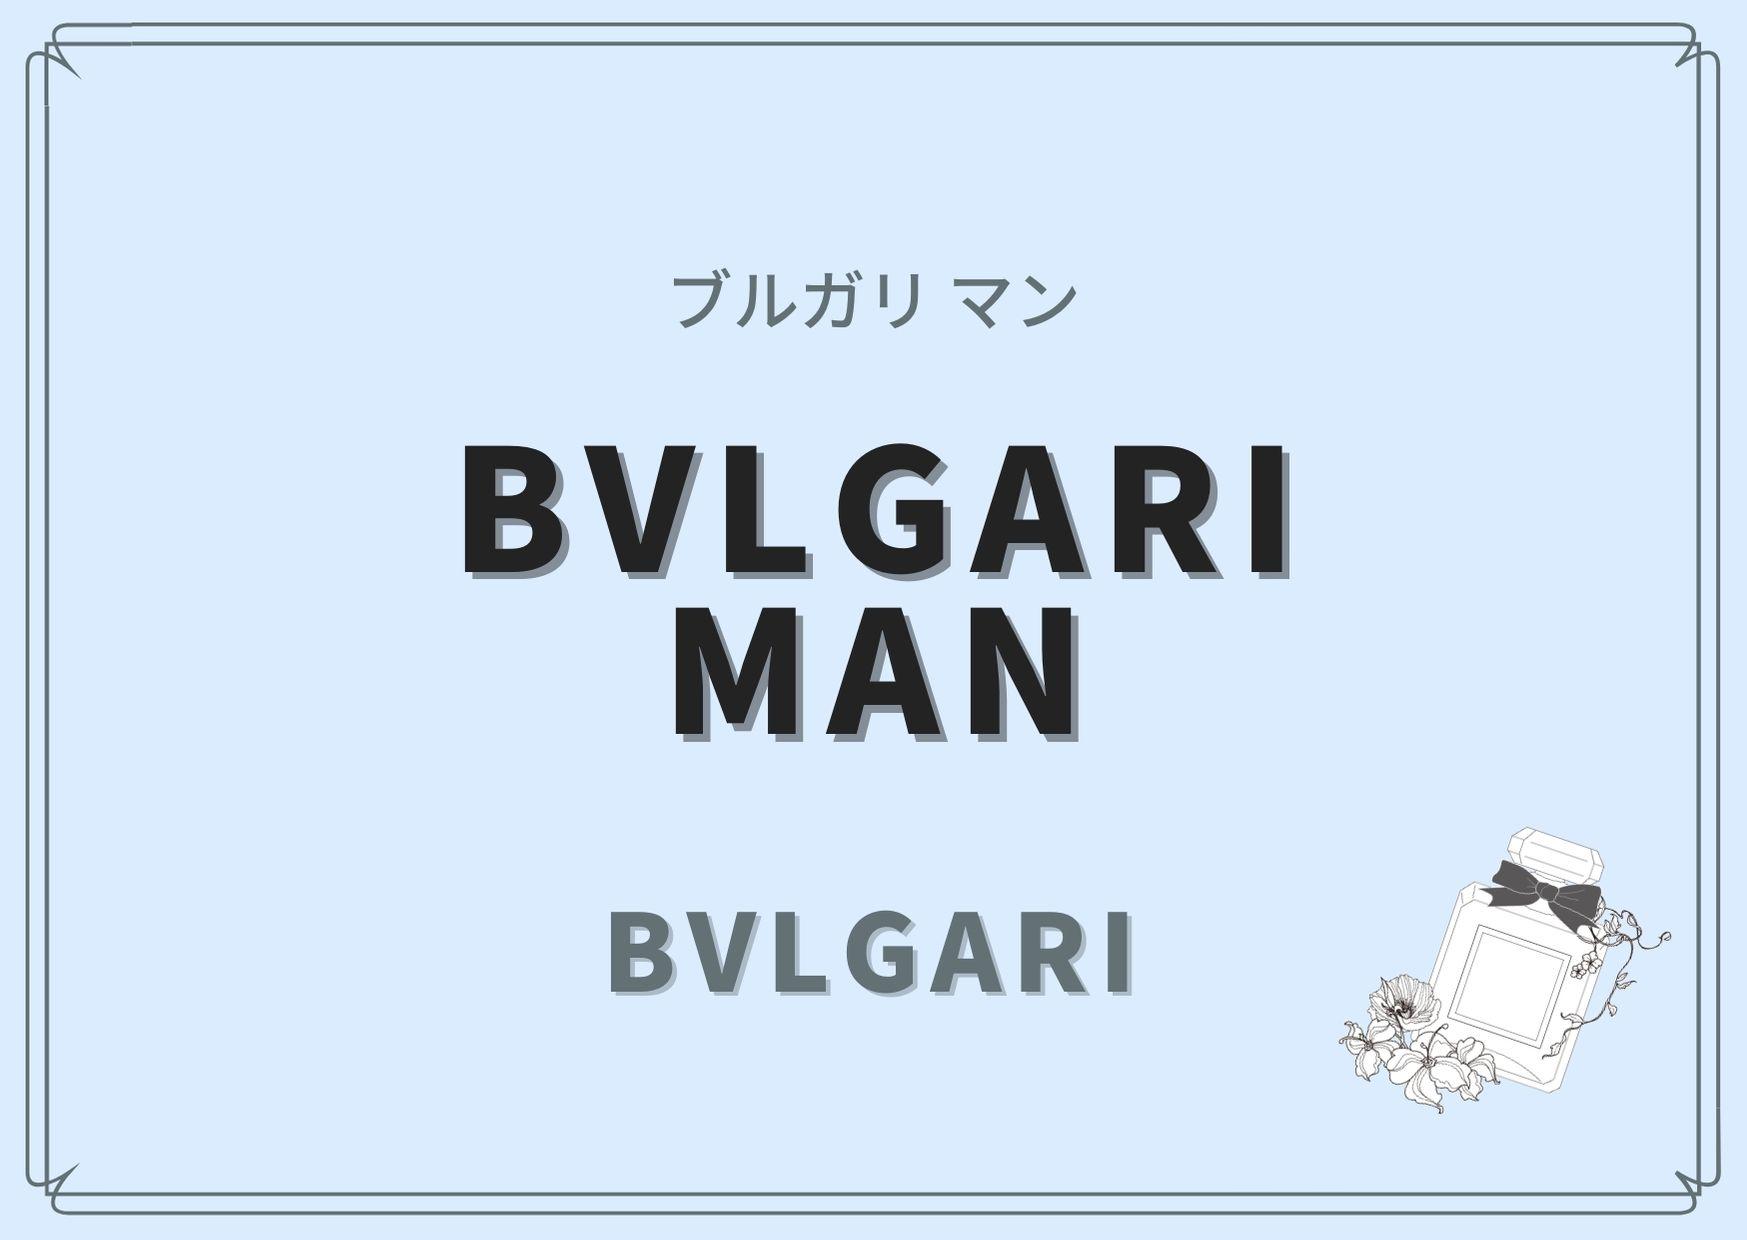 BVLGARI  MAN(ブルガリ マン)/ BVLGARI(ブルガリ)